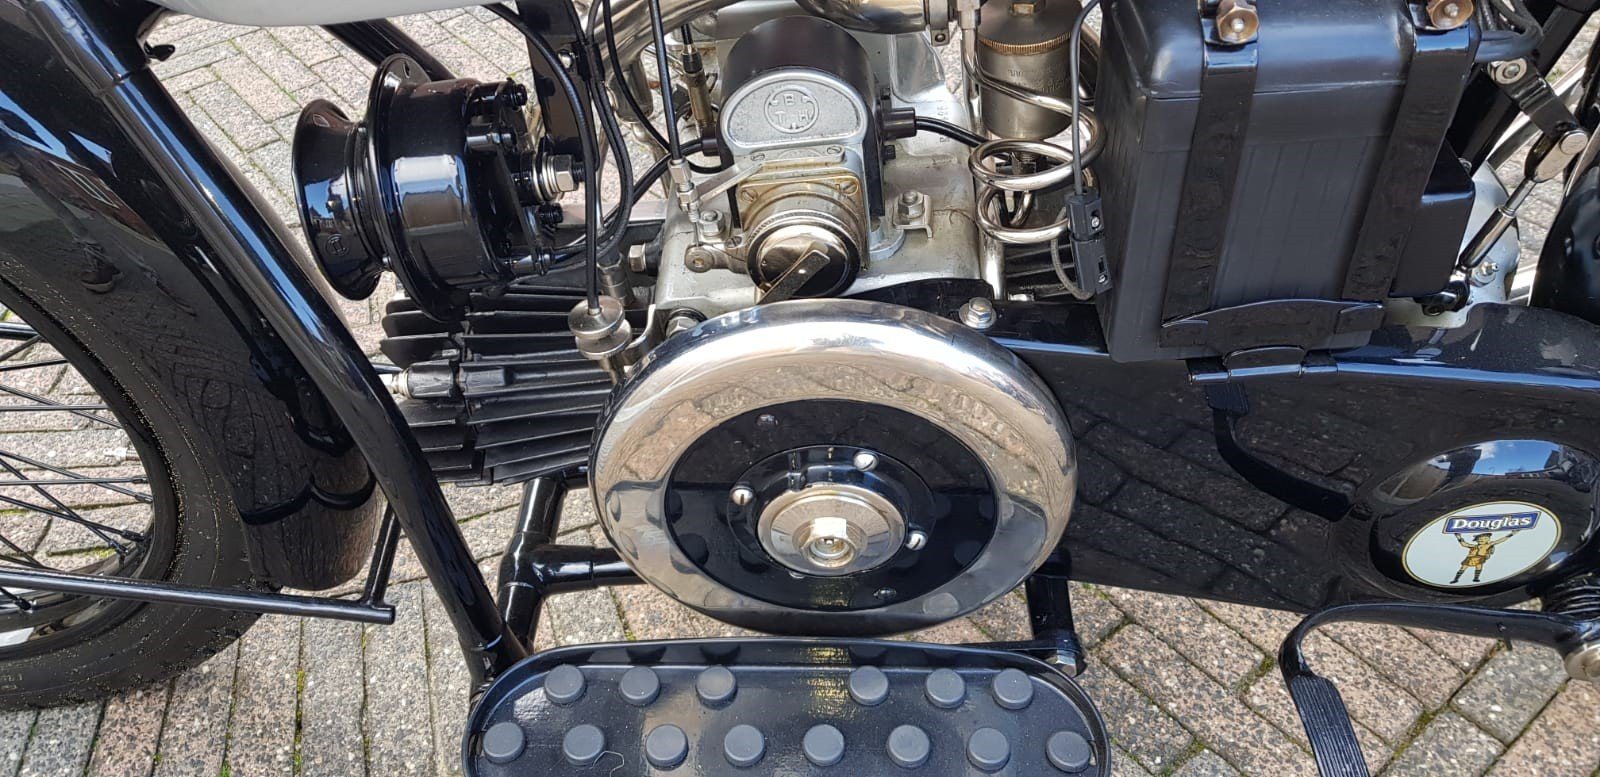 Douglas 1929 600cc SOLD (picture 2 of 6)